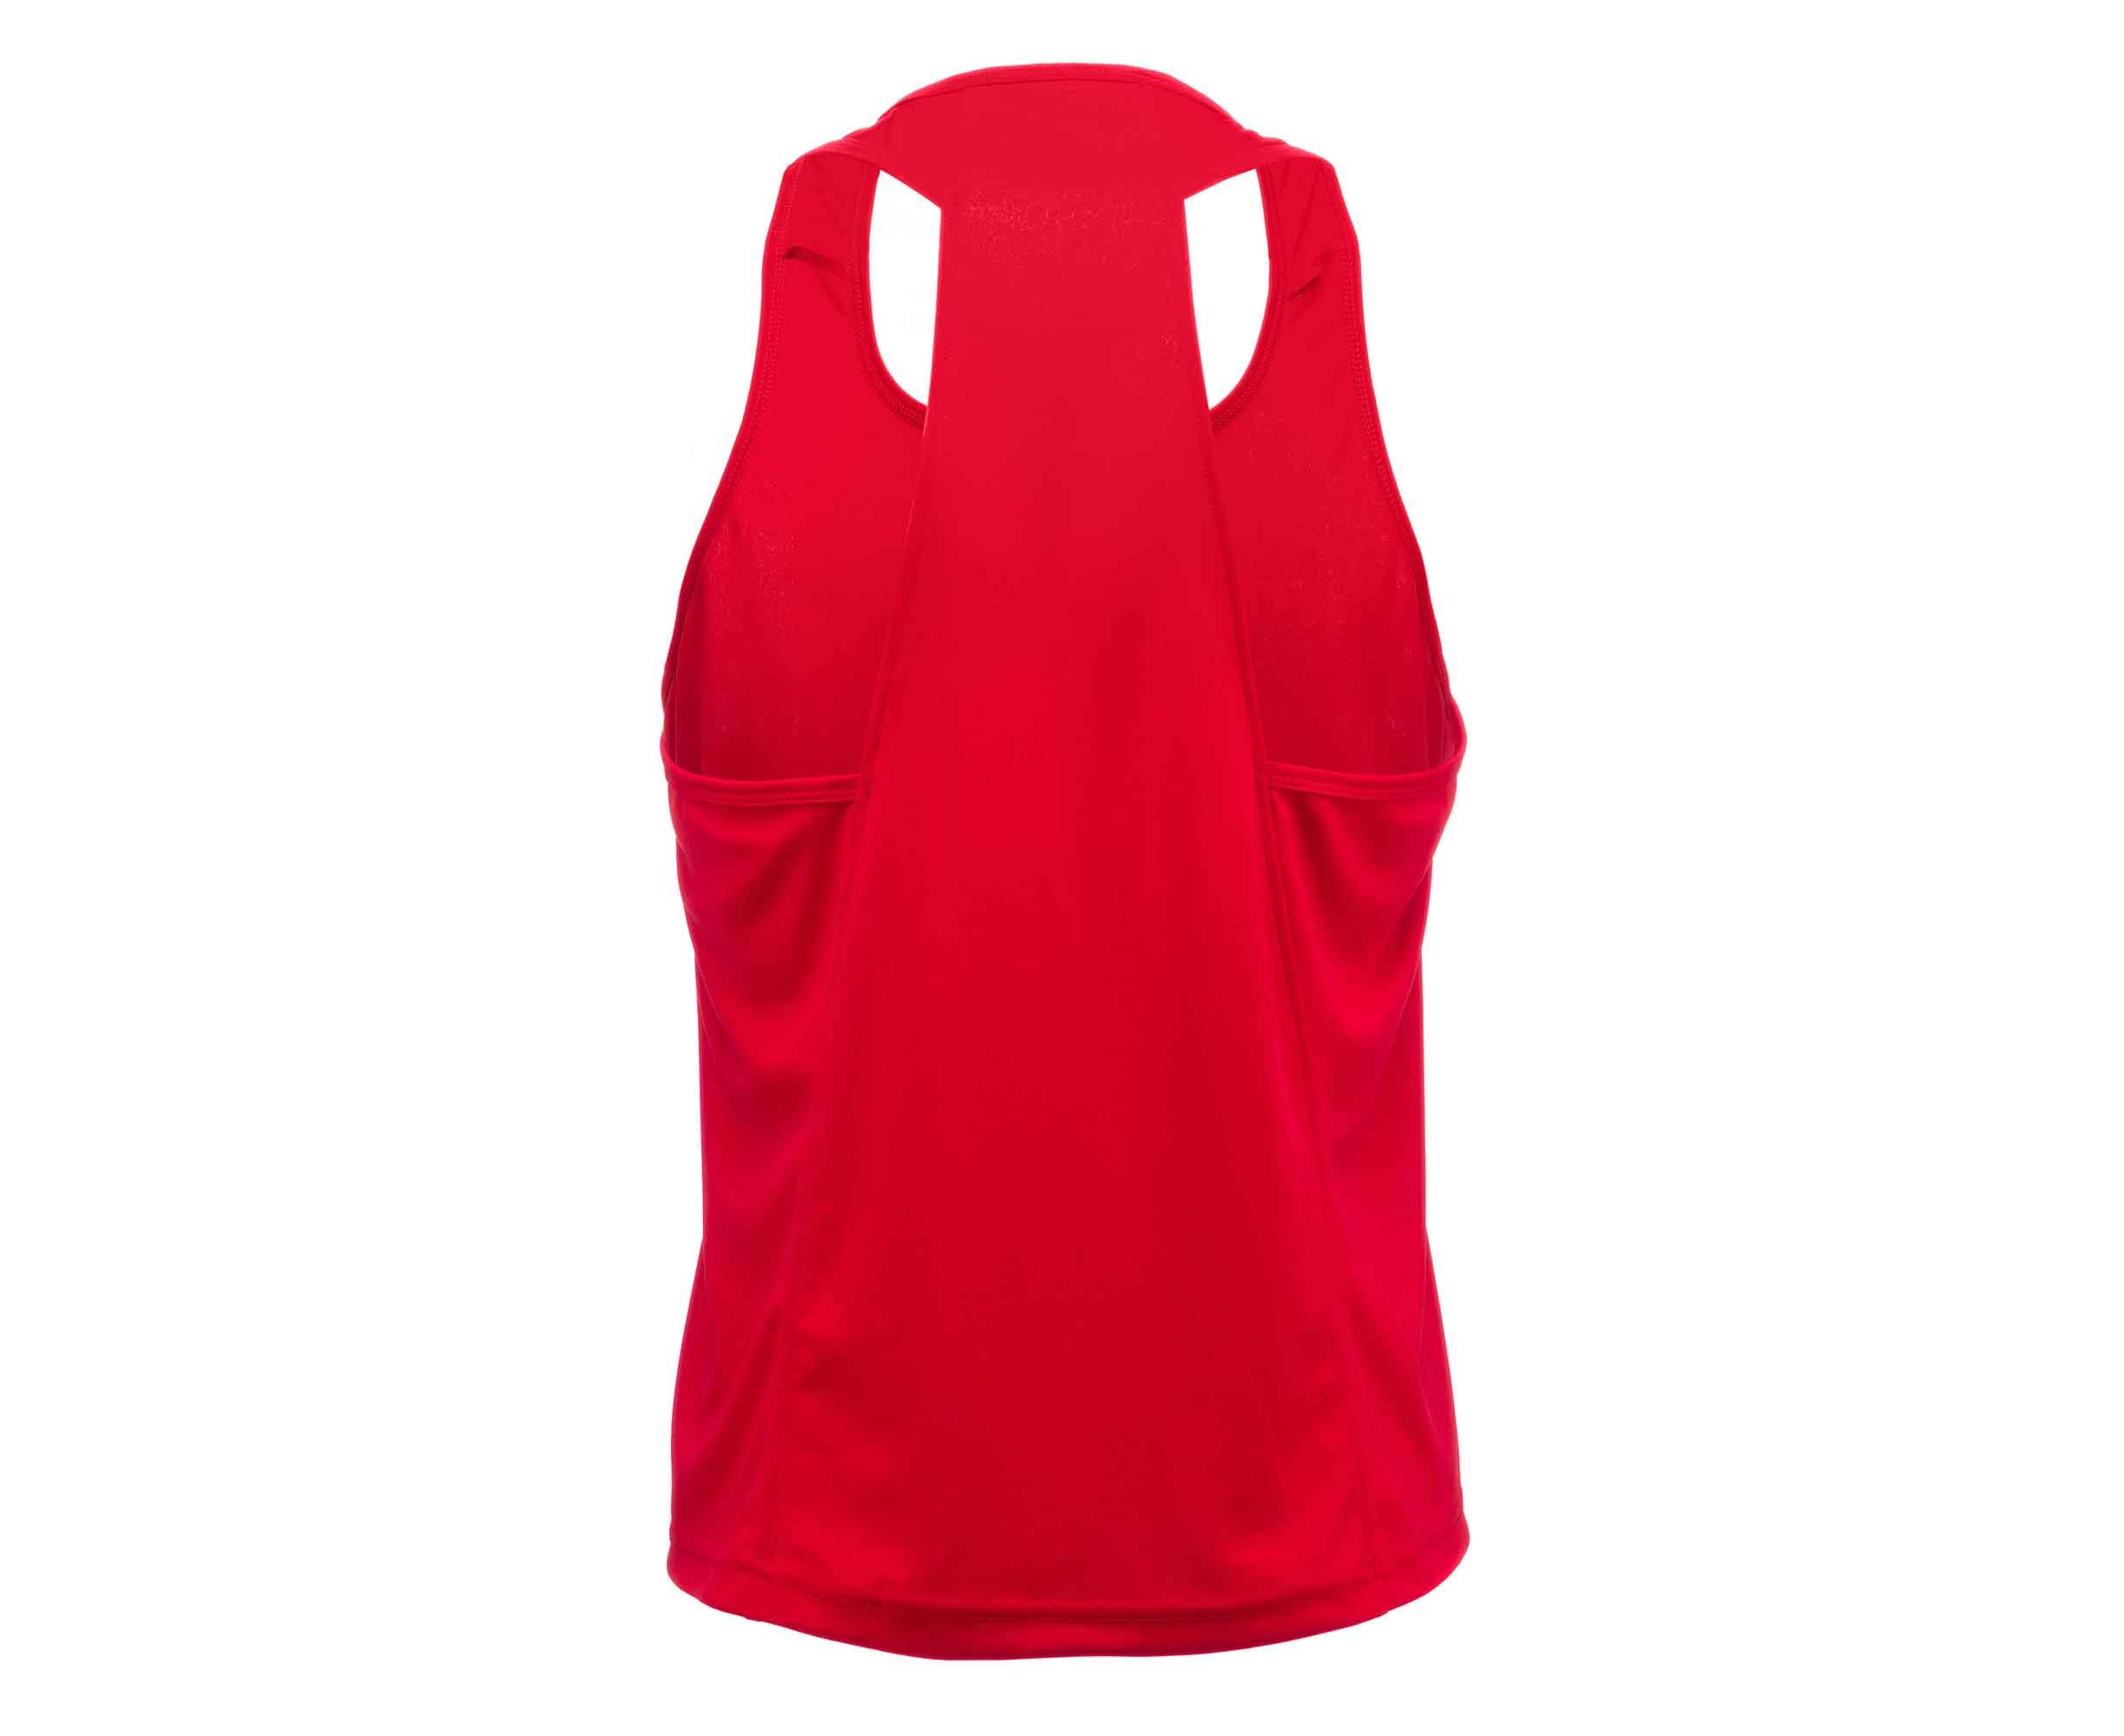 Майка боксерская Adidas Clinch Olimp красная S